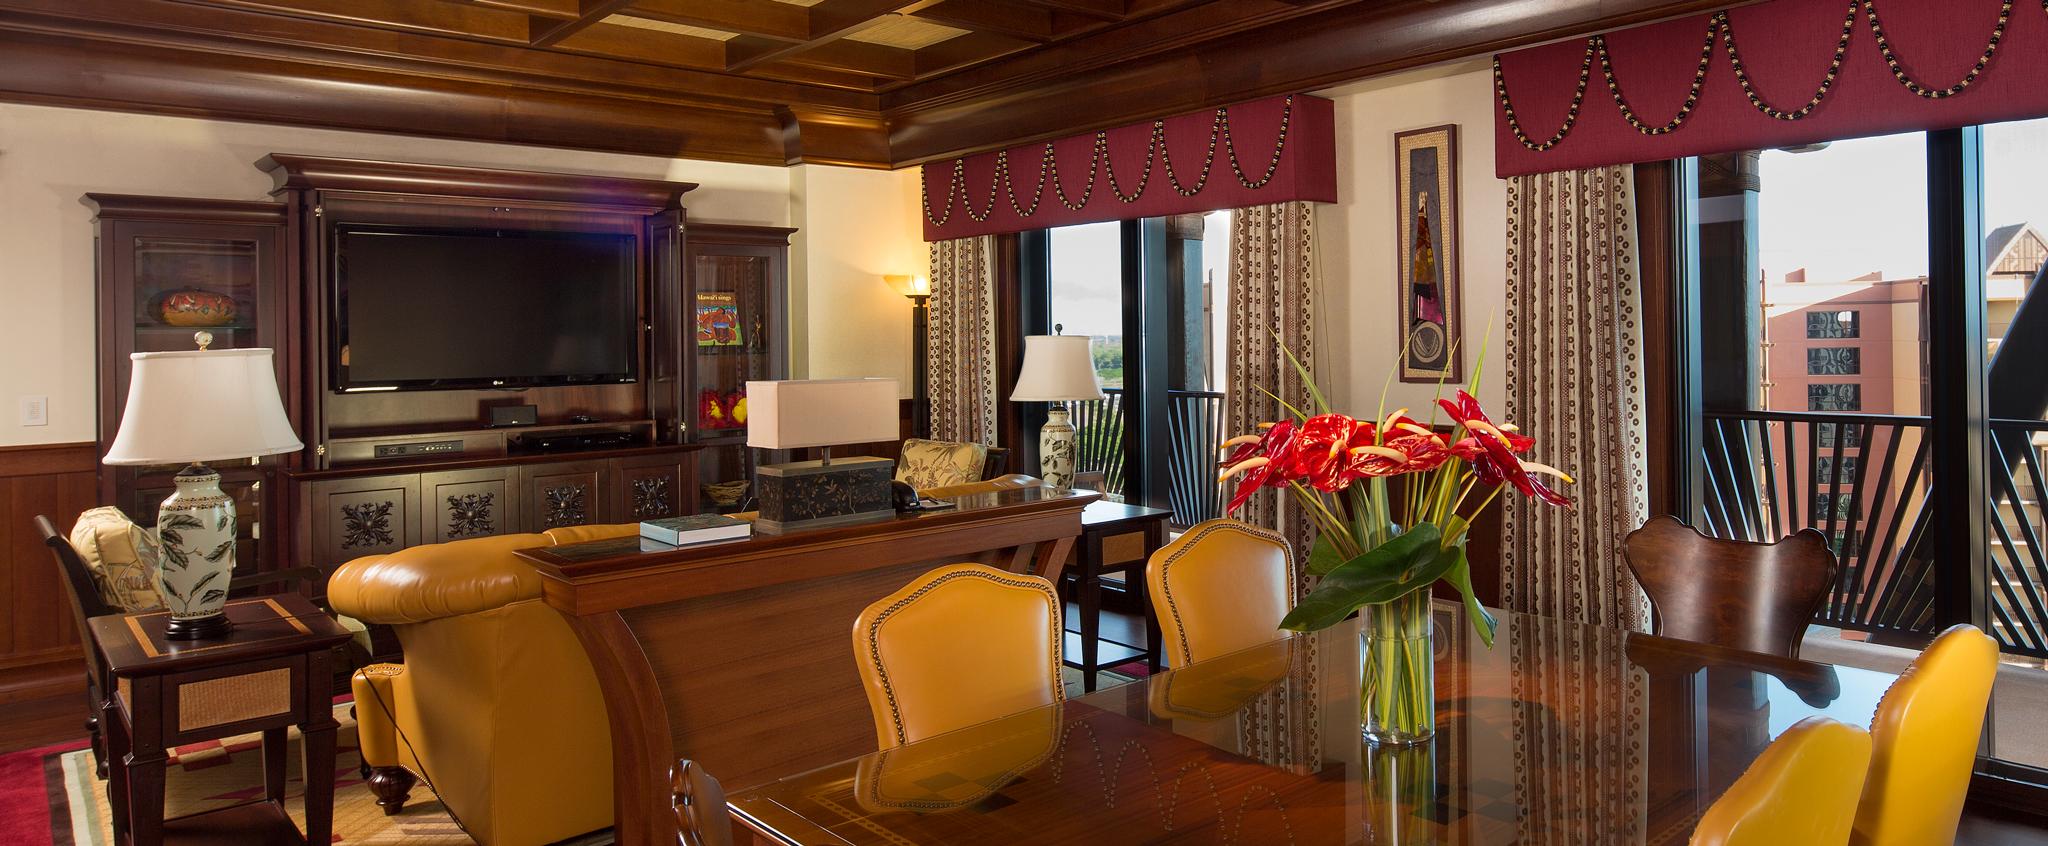 Two Bedroom Suite Aulani Hawaii Resort Amp Spa